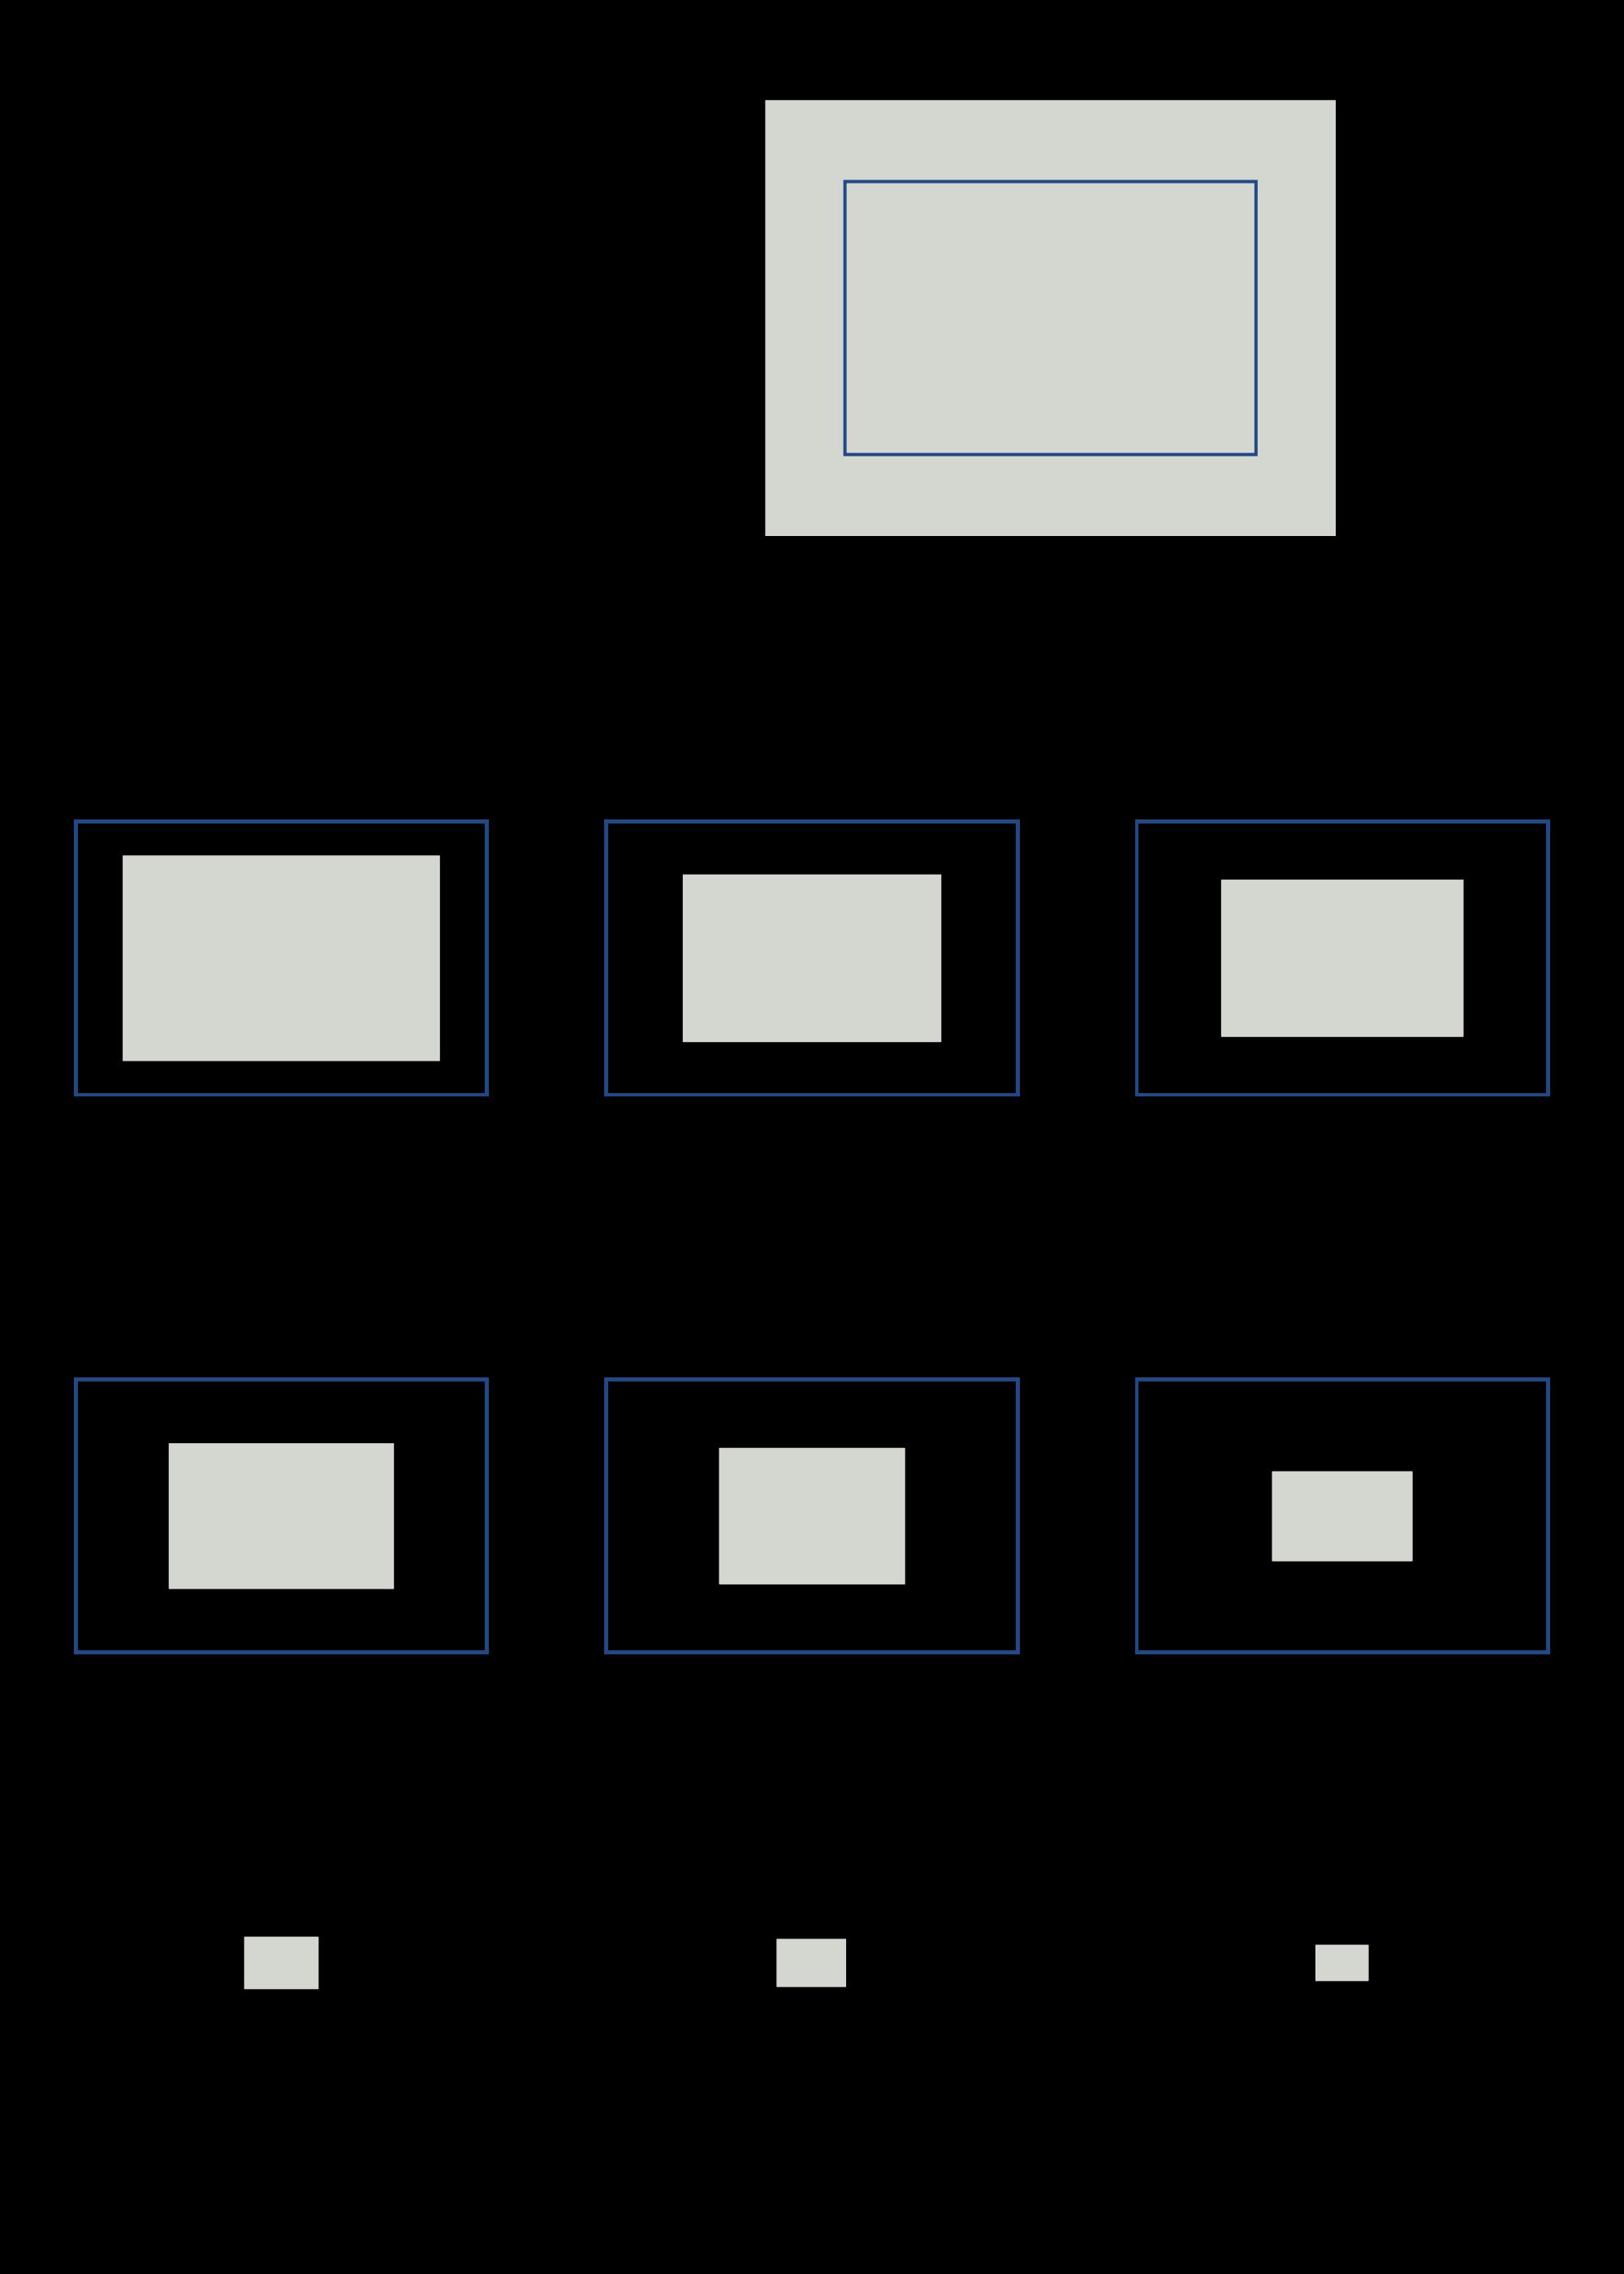 Demystifying Digital Camera Sensors Once And For All Digital Camera Camera Sensor Size Digital Single Lens Reflex Camera